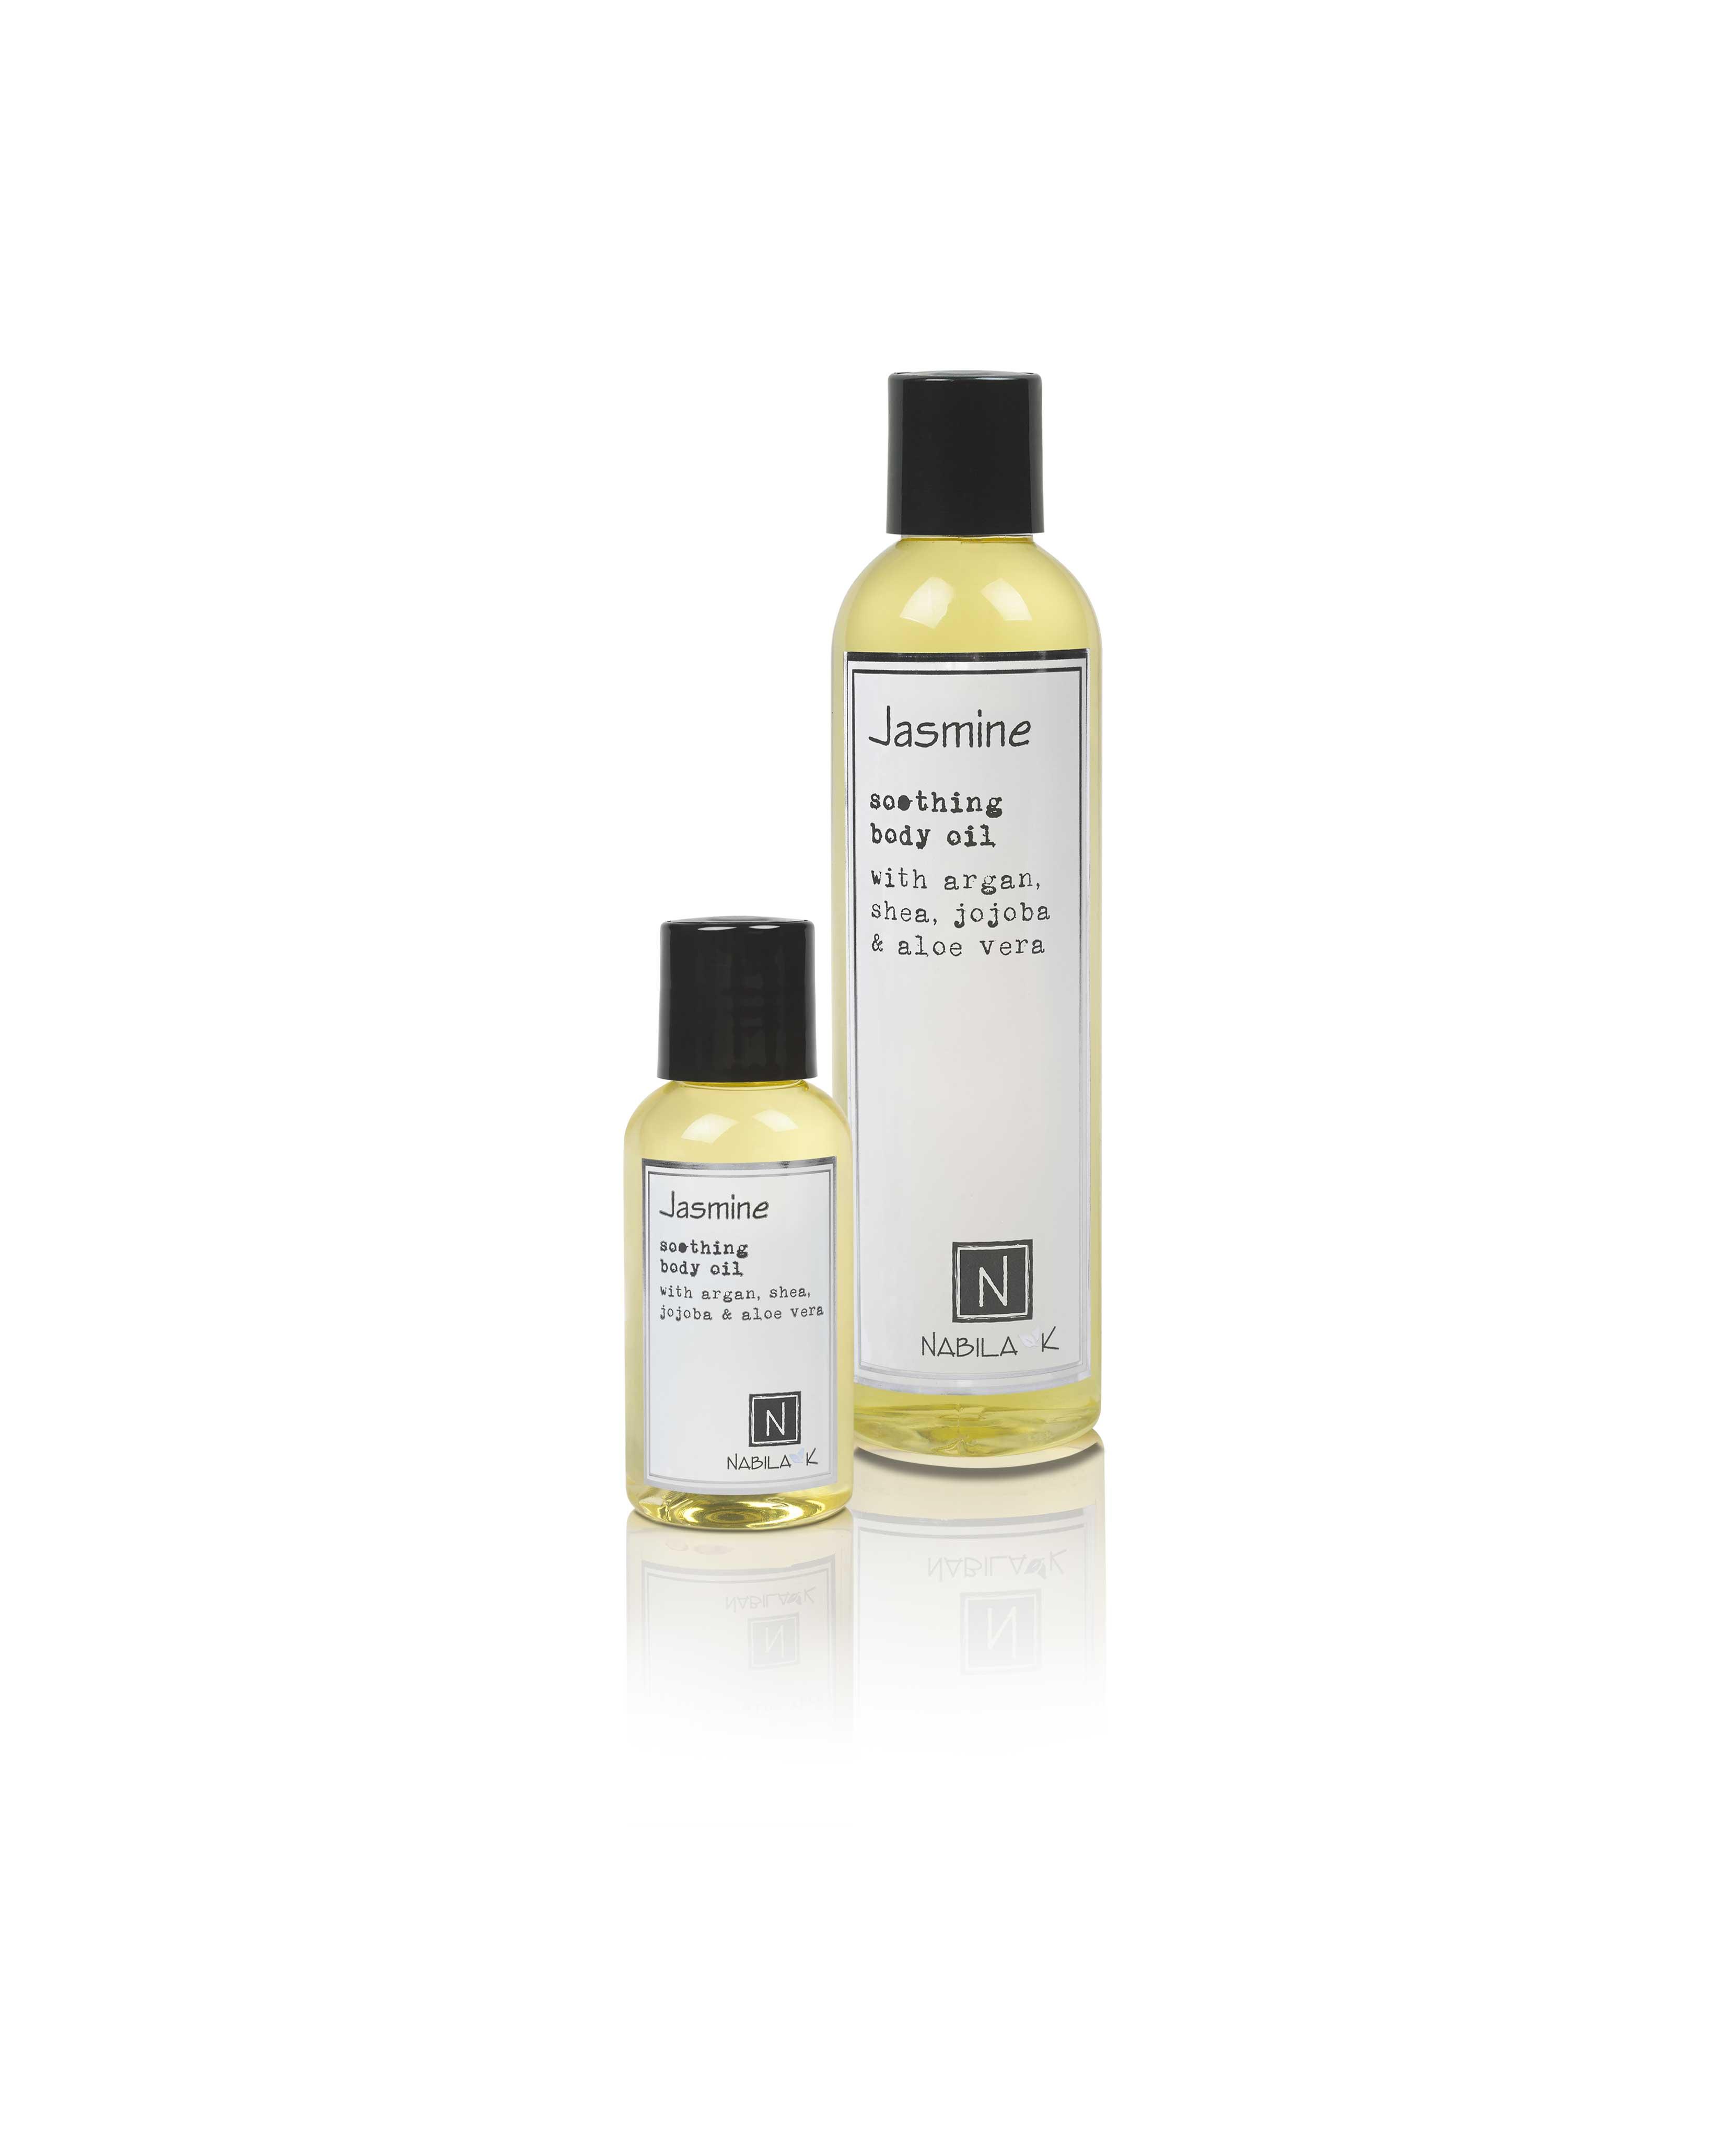 1 2.4oz and 1 9oz Bottle of Jasmine Soothing Body Oil with Argan, shea, jojoba, and aloe vera